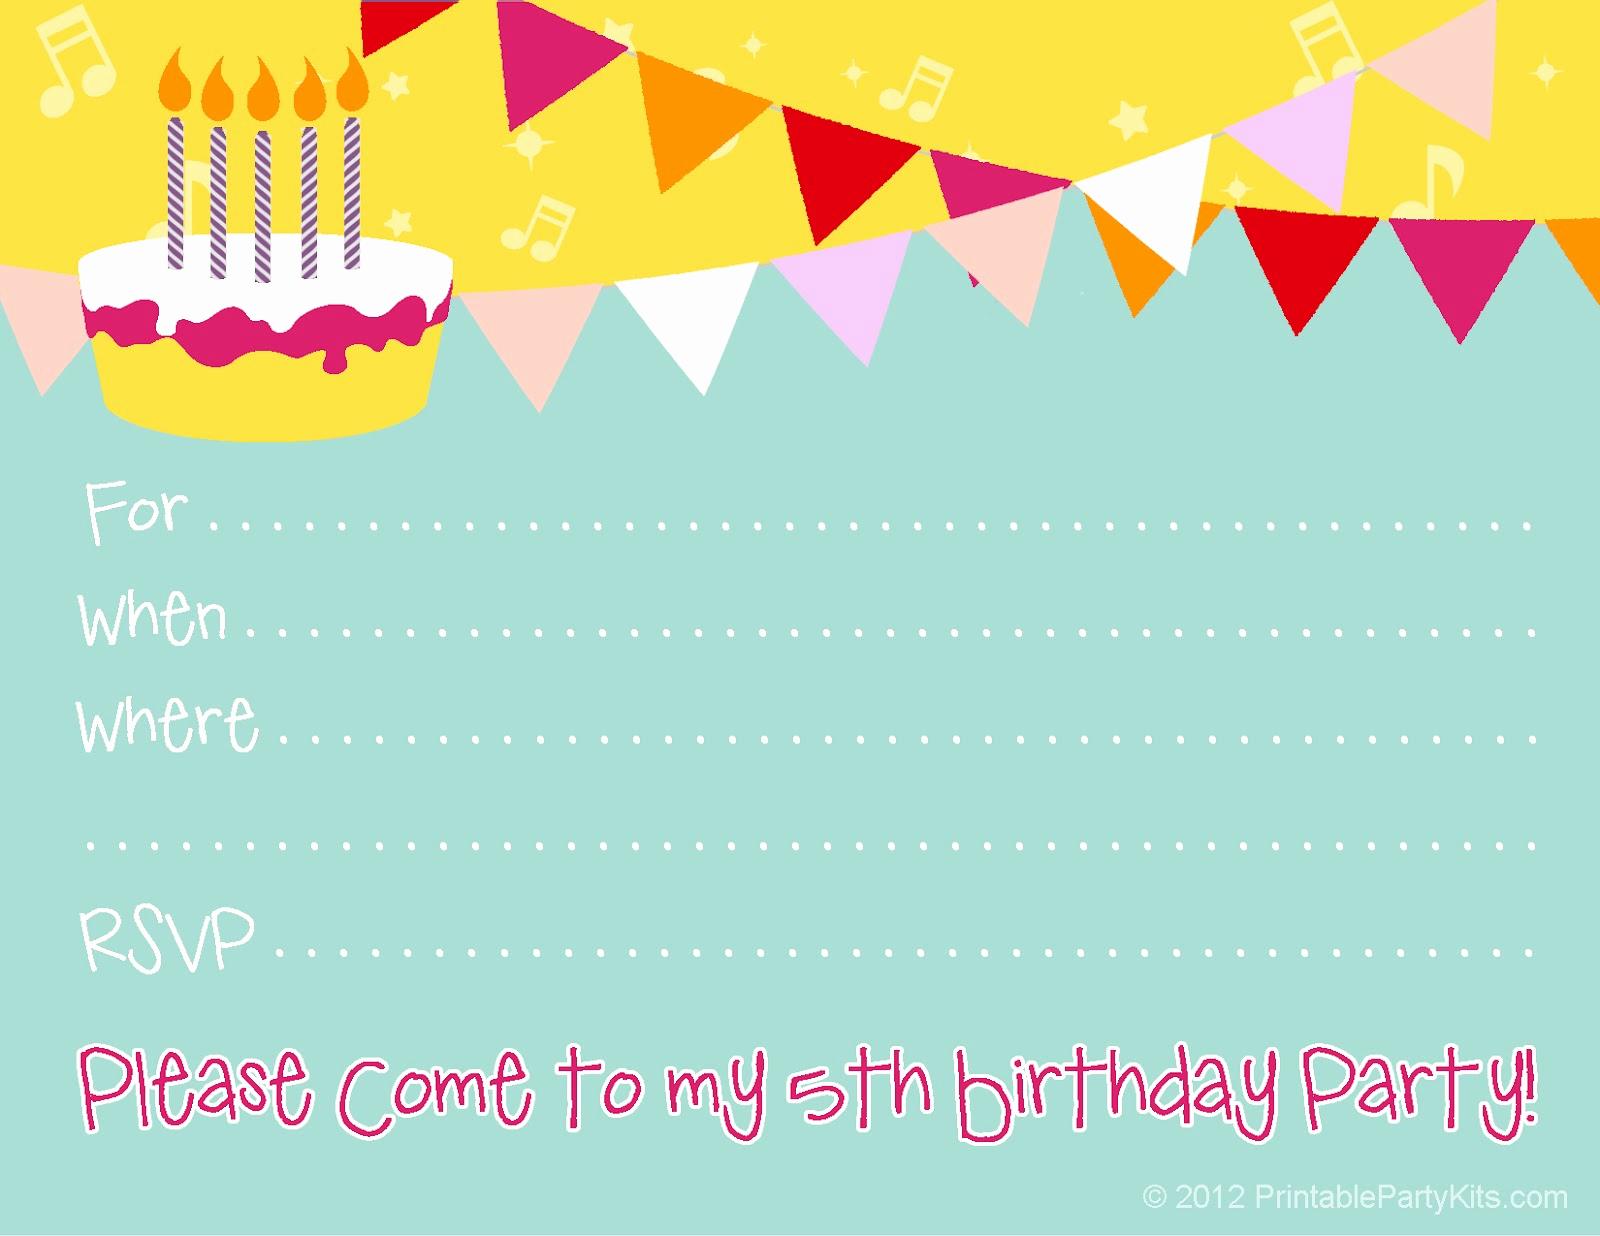 Birthday Party Invitation Template New Free Birthday Party Invitations for Girl – Free Printable